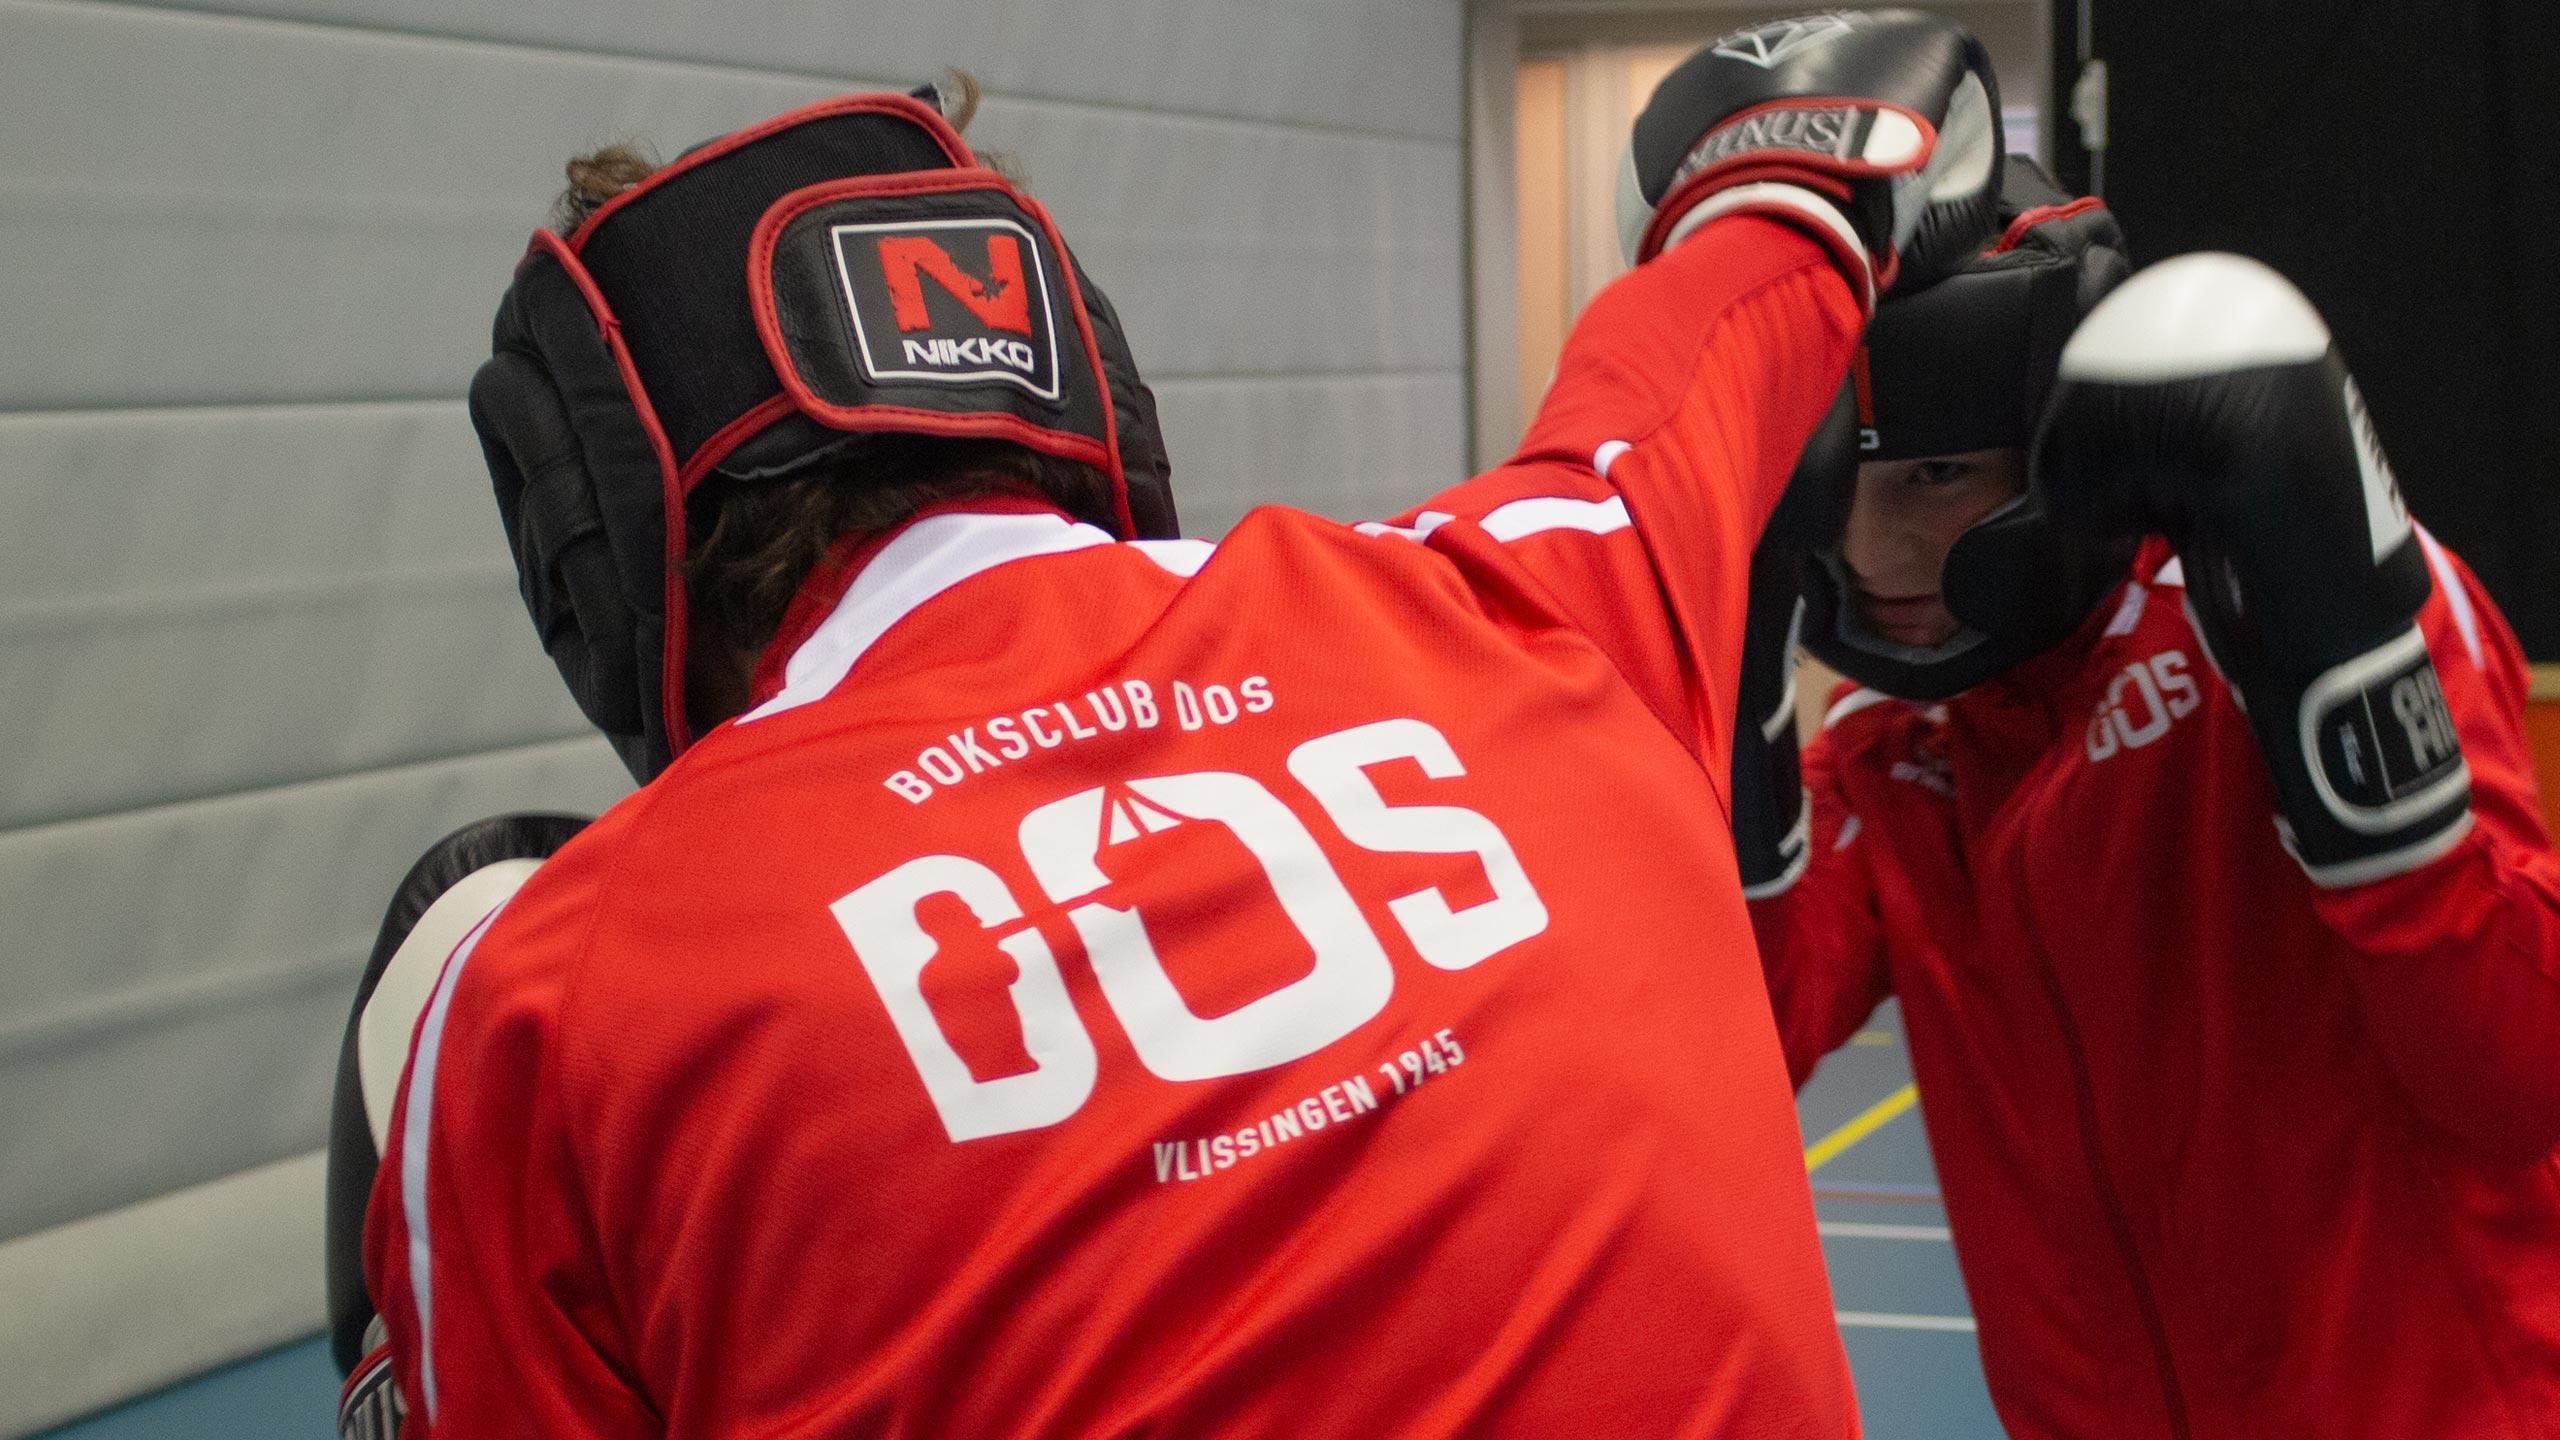 Boksclub DOS logo trainingspak